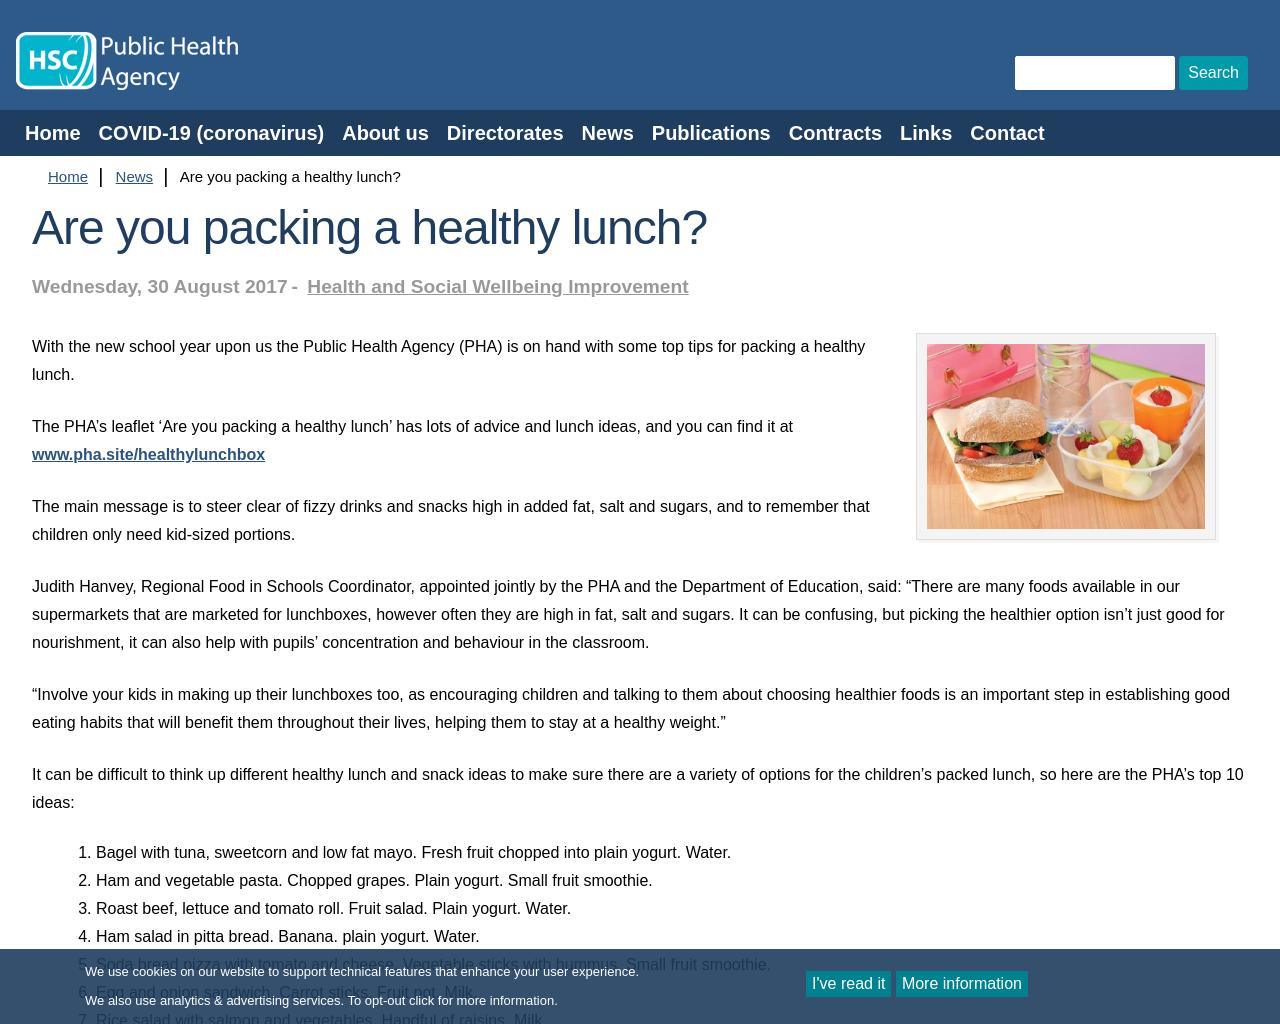 PHA NI  - Ideas for a Healthy Lunchbox